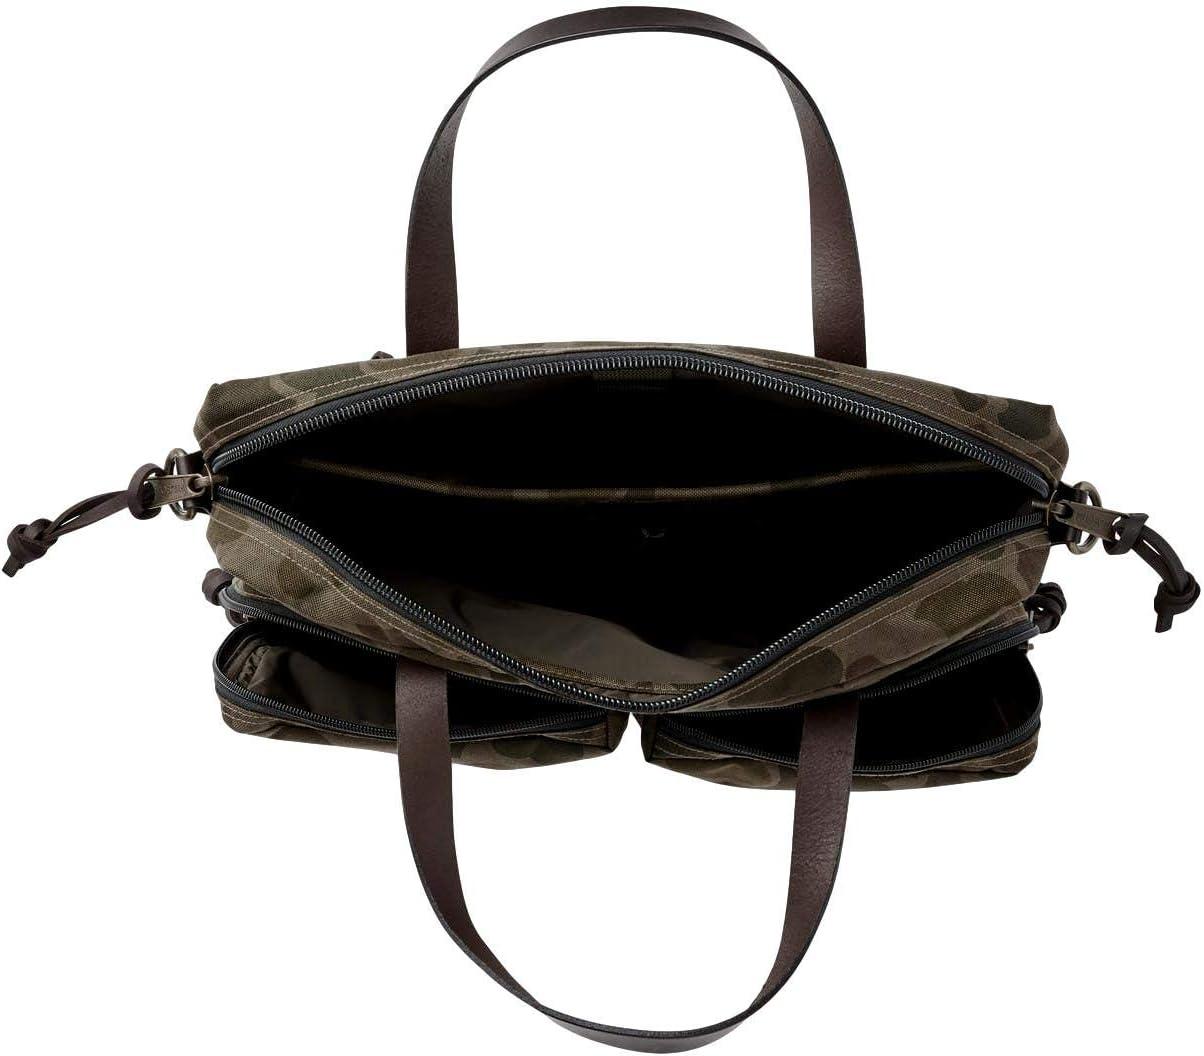 Dark Camo Shrub Filson Dryden Briefcase